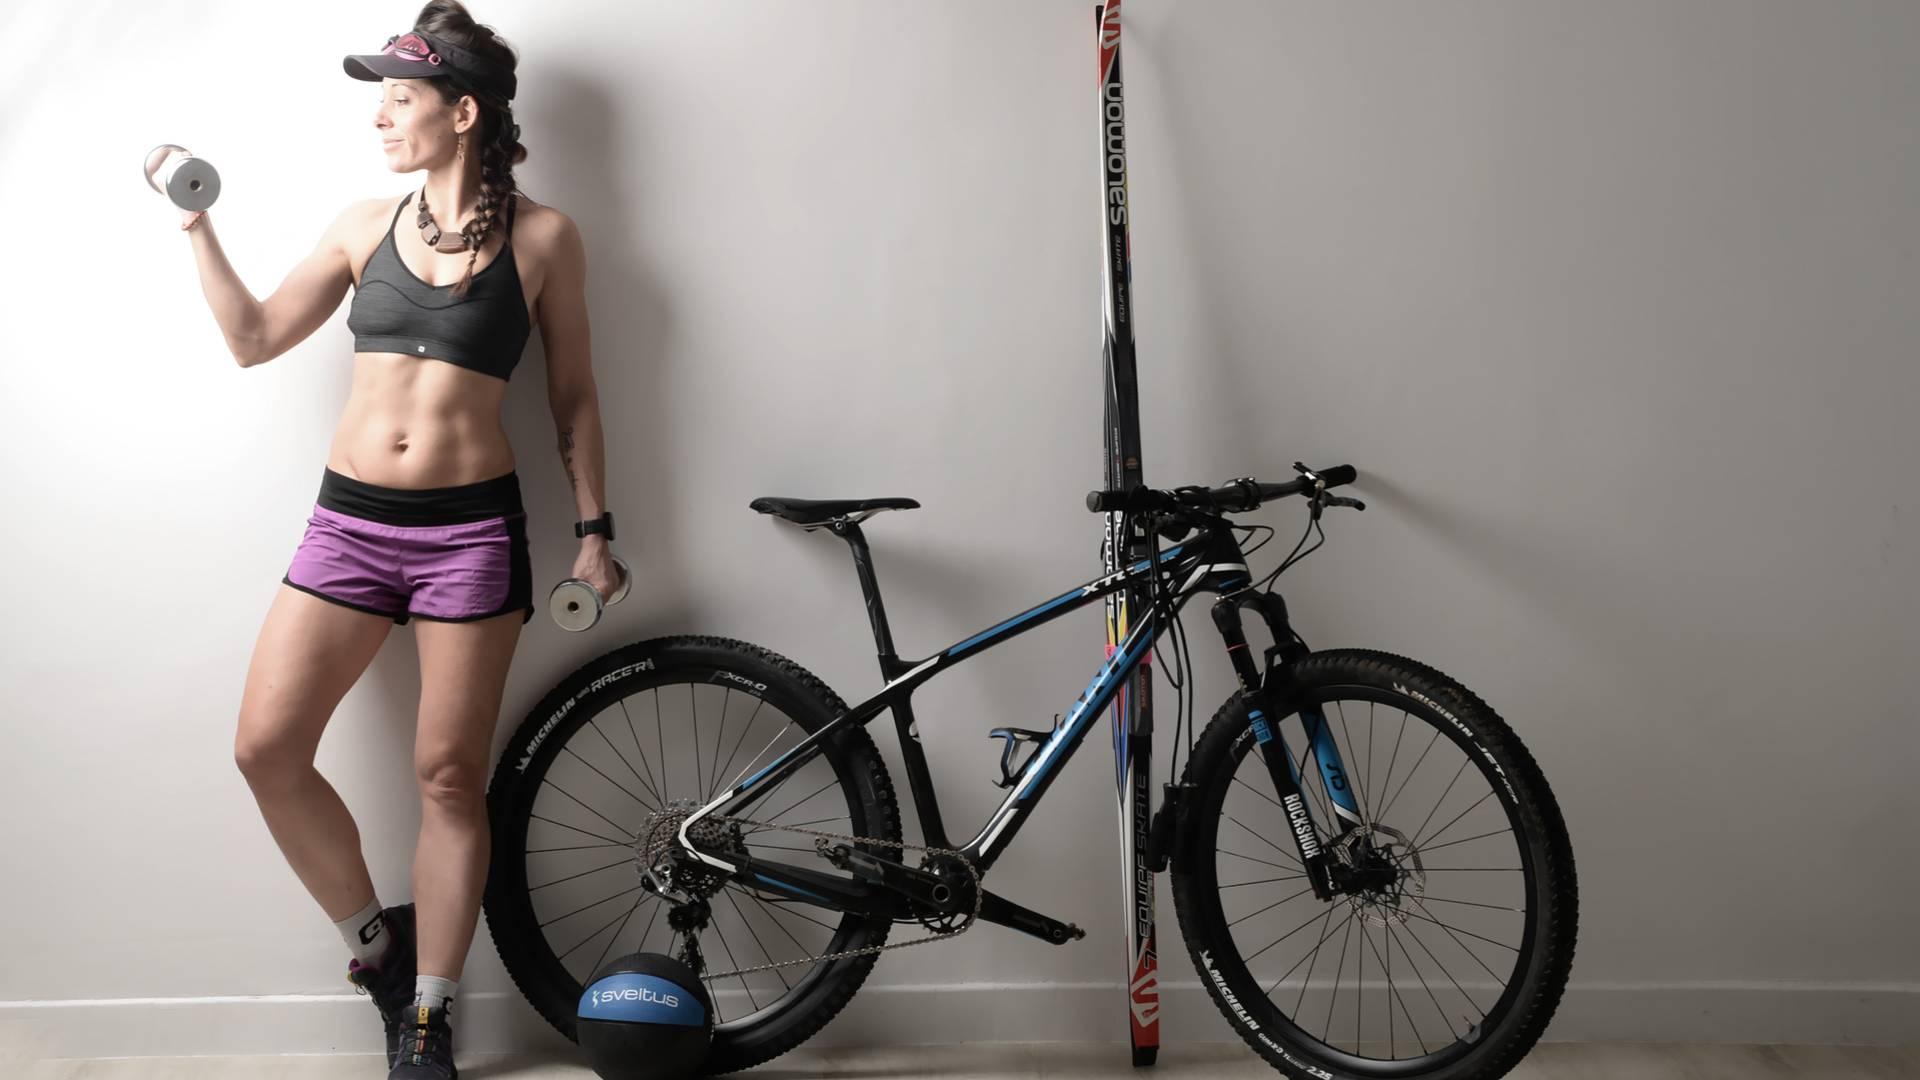 Lucie Chainel - Sportif VTT - Championne VTT Vosges